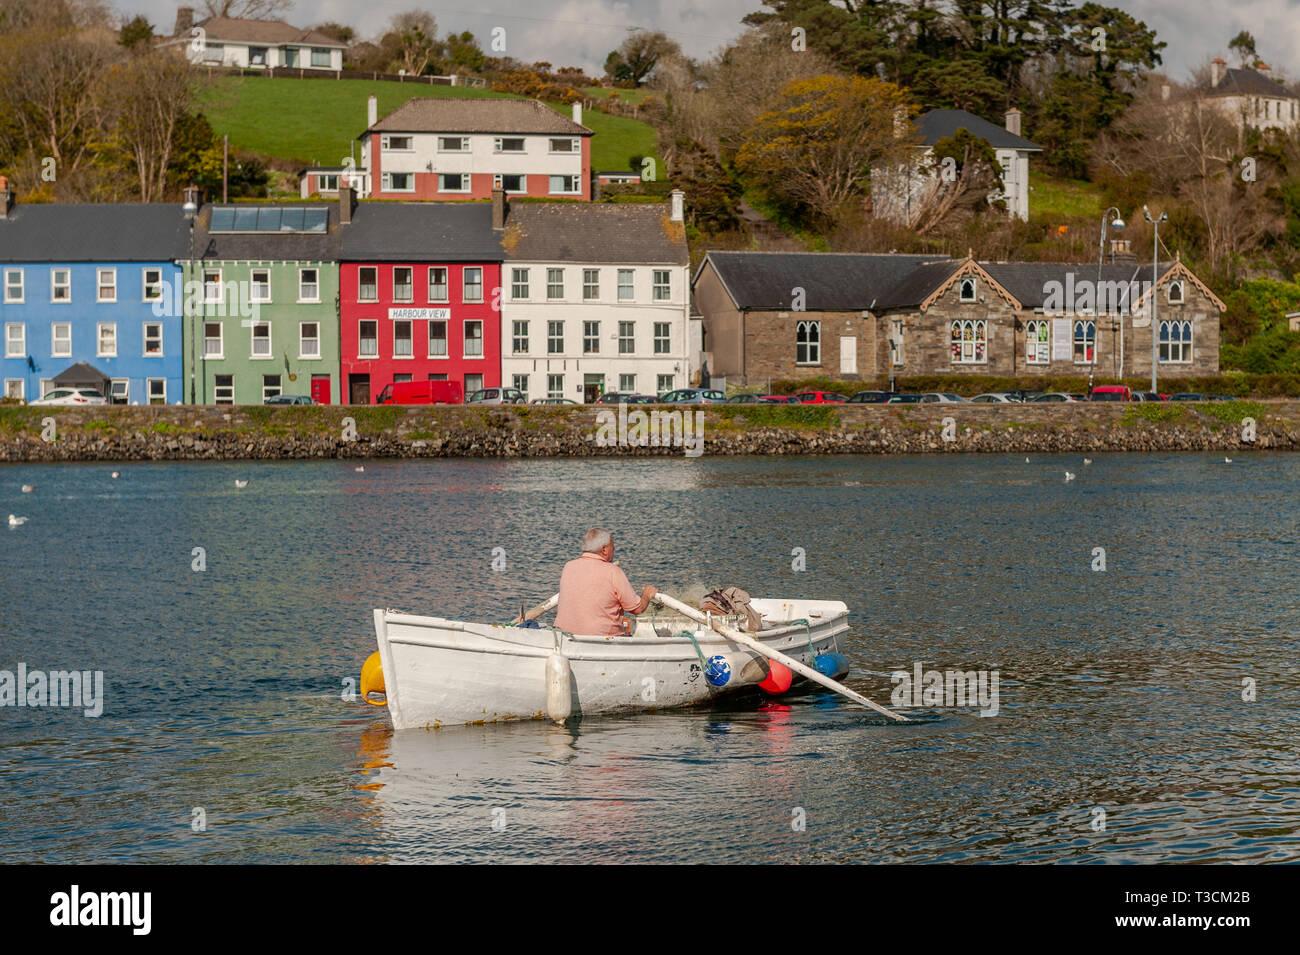 fisherman-rowing-a-boat-in-bantry-harbour-west-cork-ireland-T3CM2B.jpg